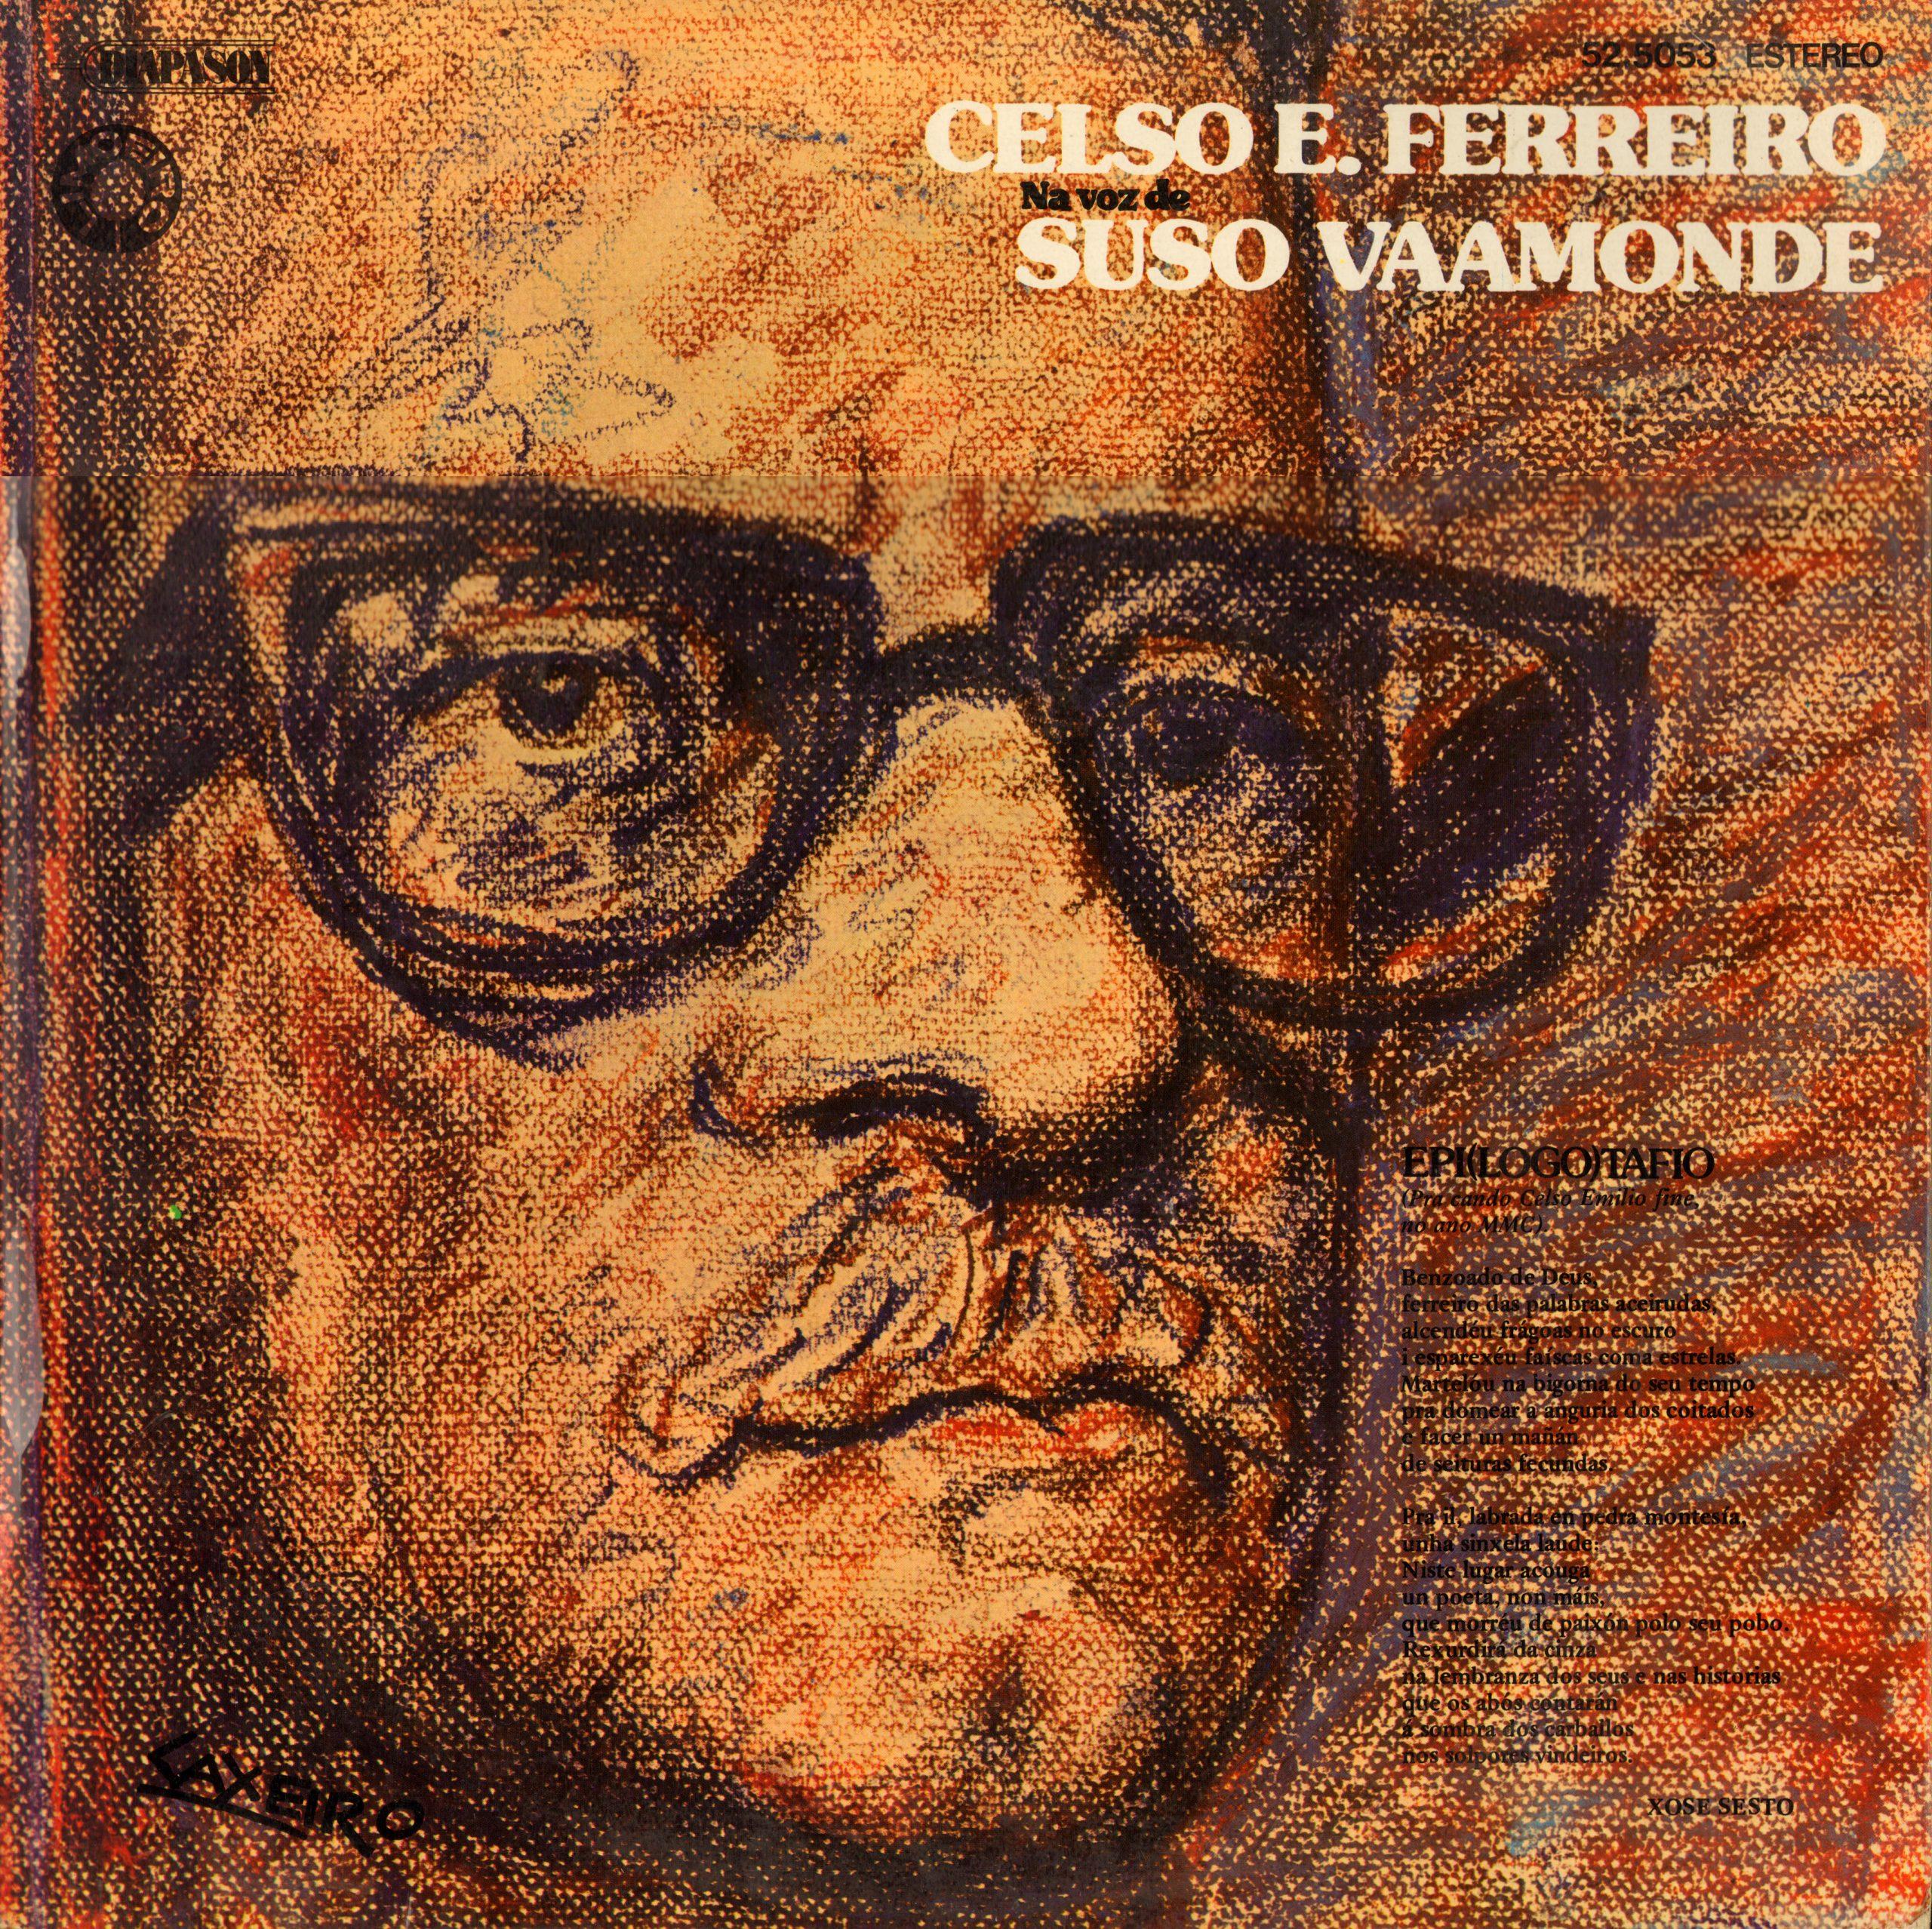 portada del album Celso Emilio Ferreiro na Voz de Suso Vaamonde